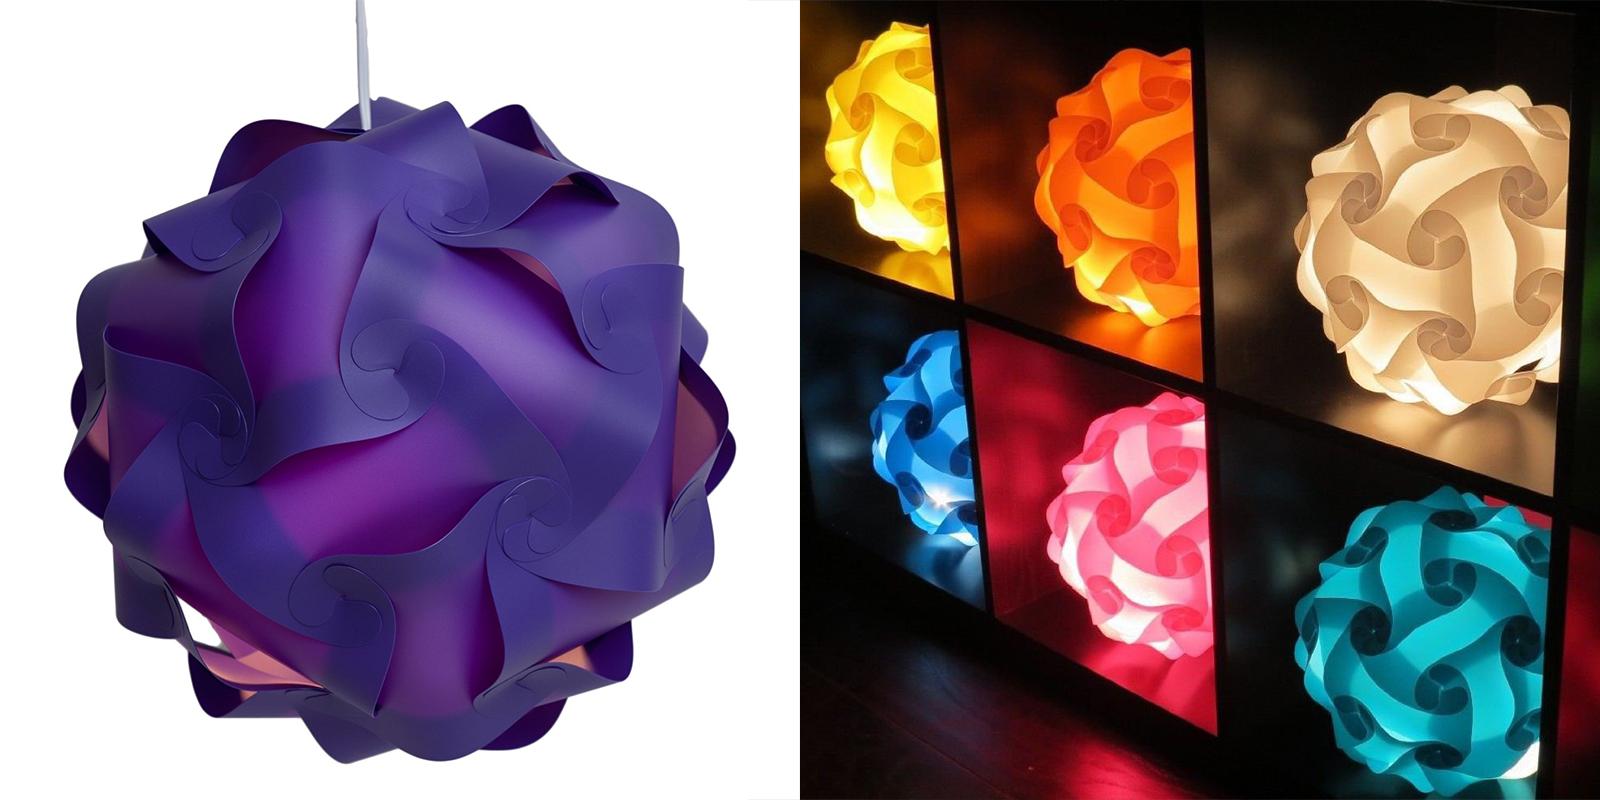 Niki Nu Lites Puzzle Lamp in Various Colors